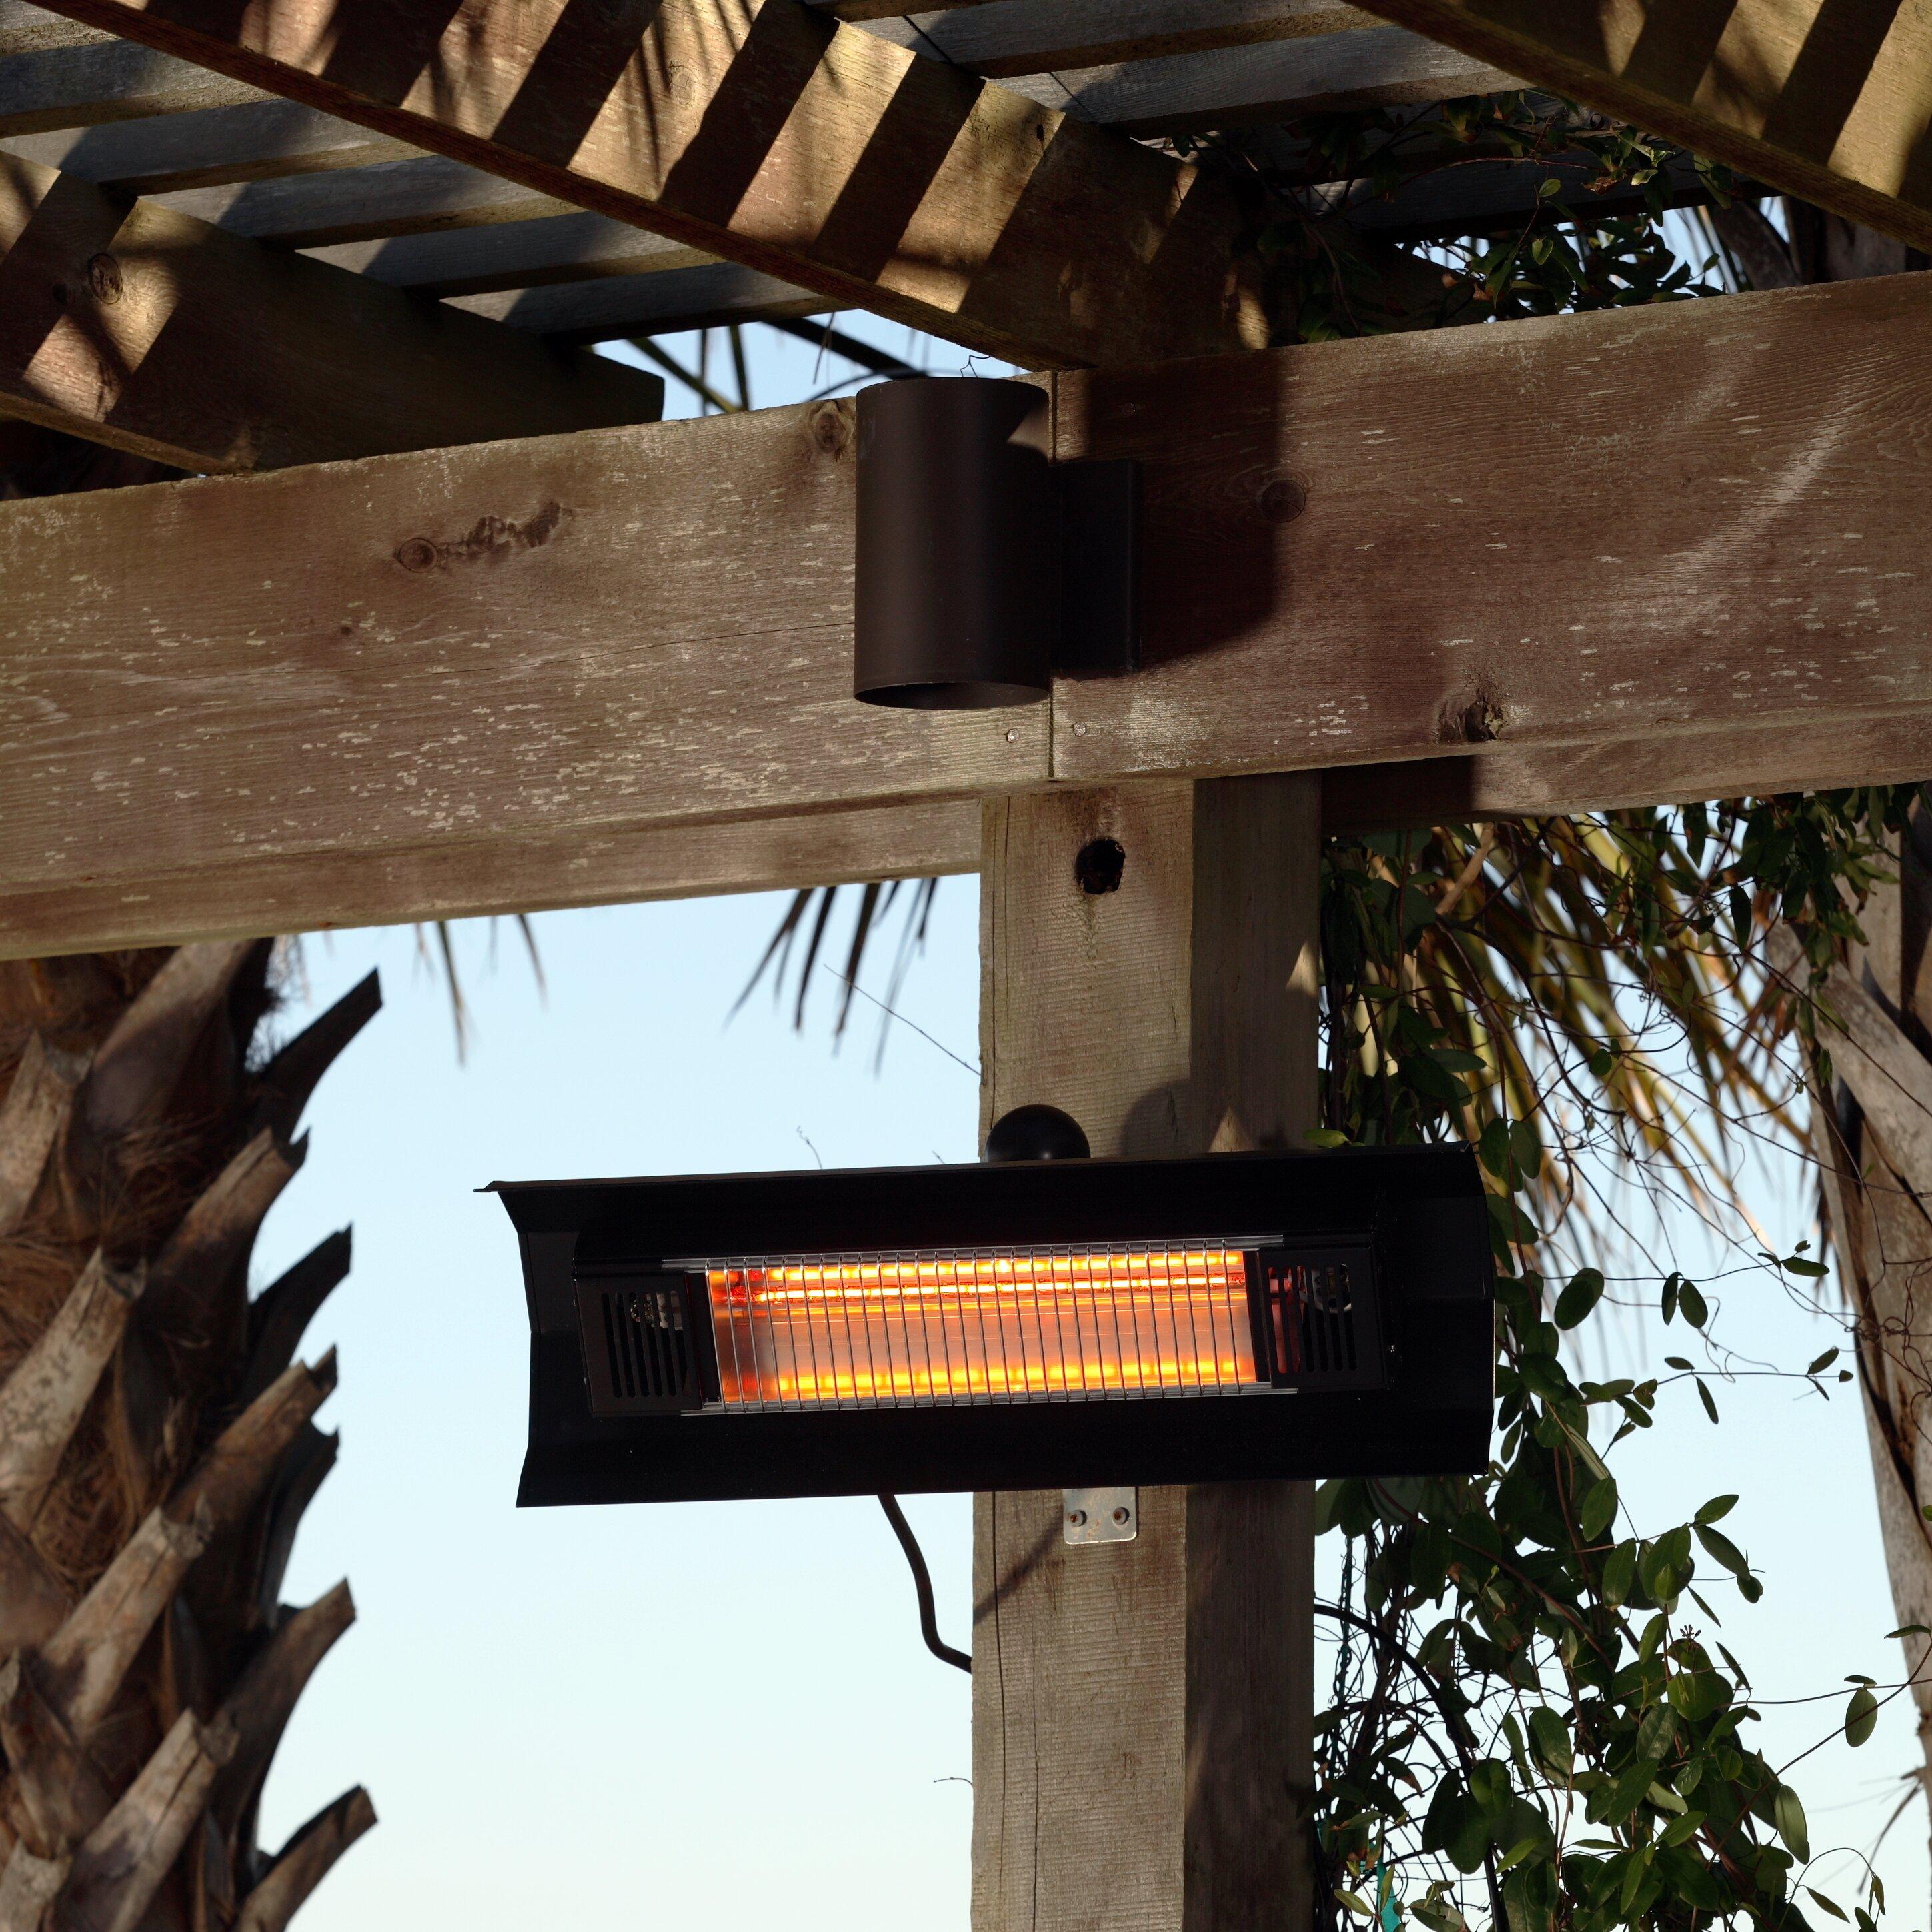 Outdoor Heating  Electric Patio Heaters Fire Sense SKU: FRS1173